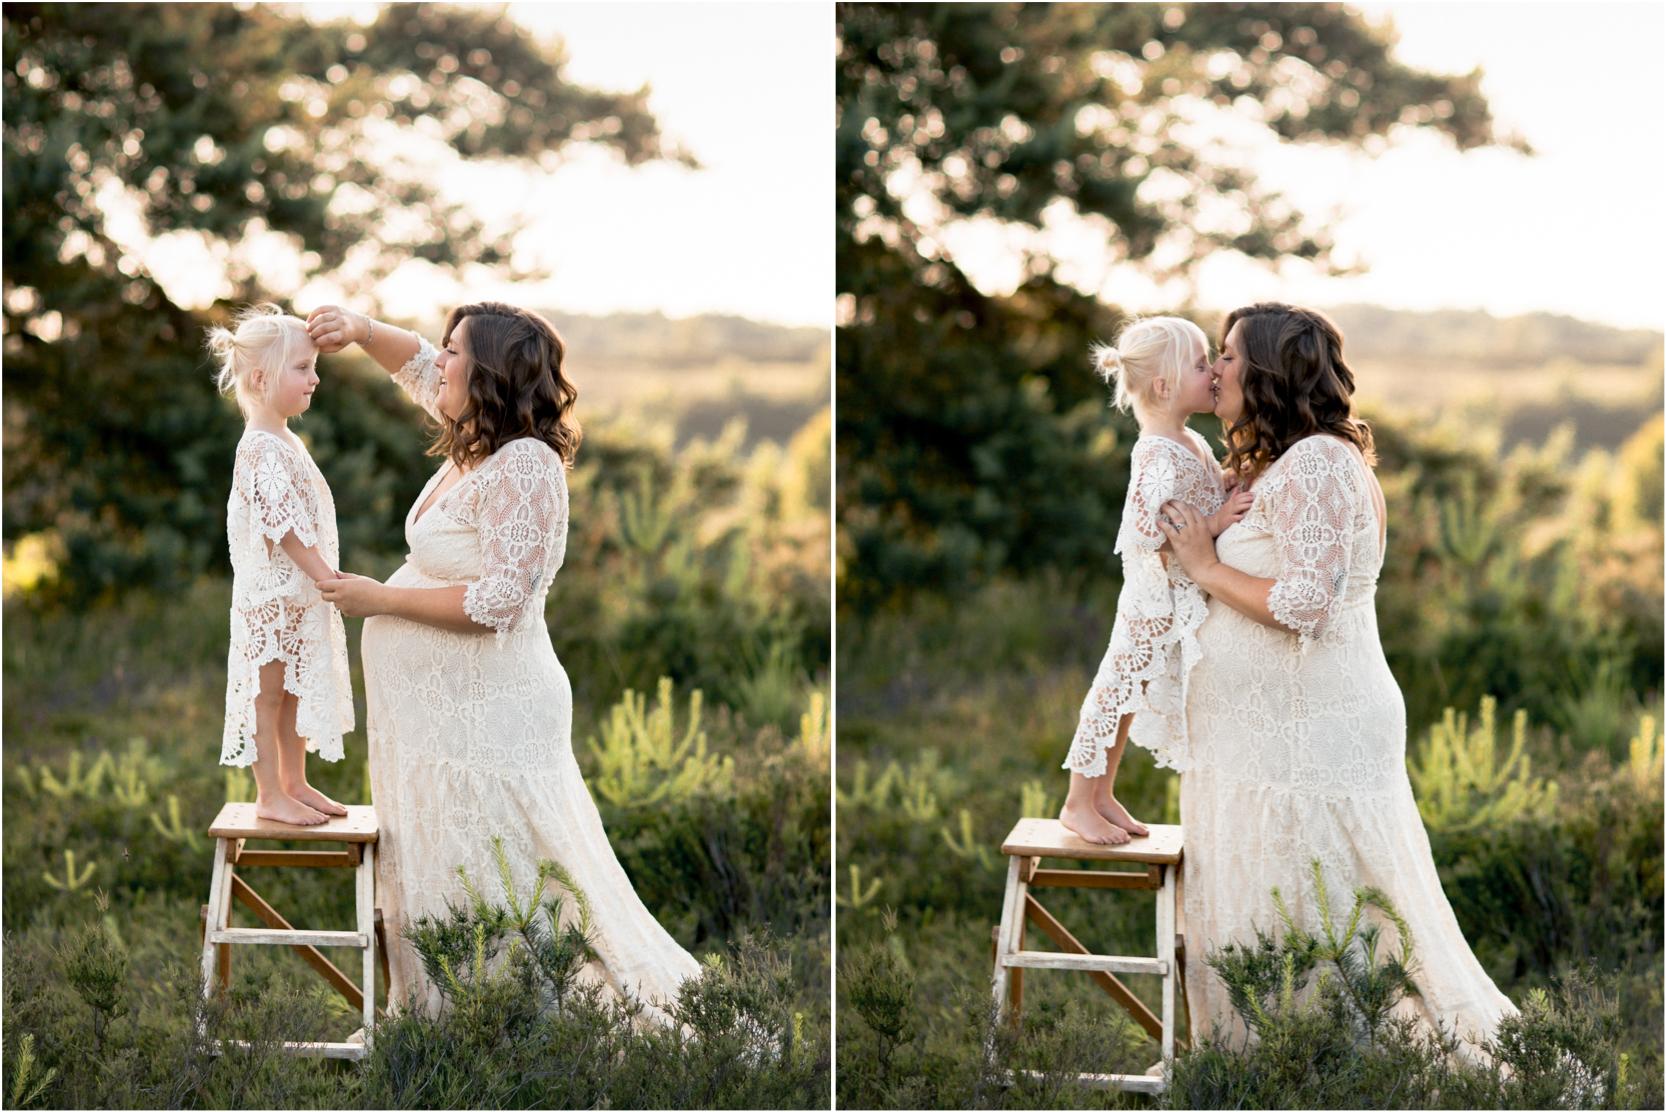 Rebecca Searle Photography Maternity Photography 2.jpg